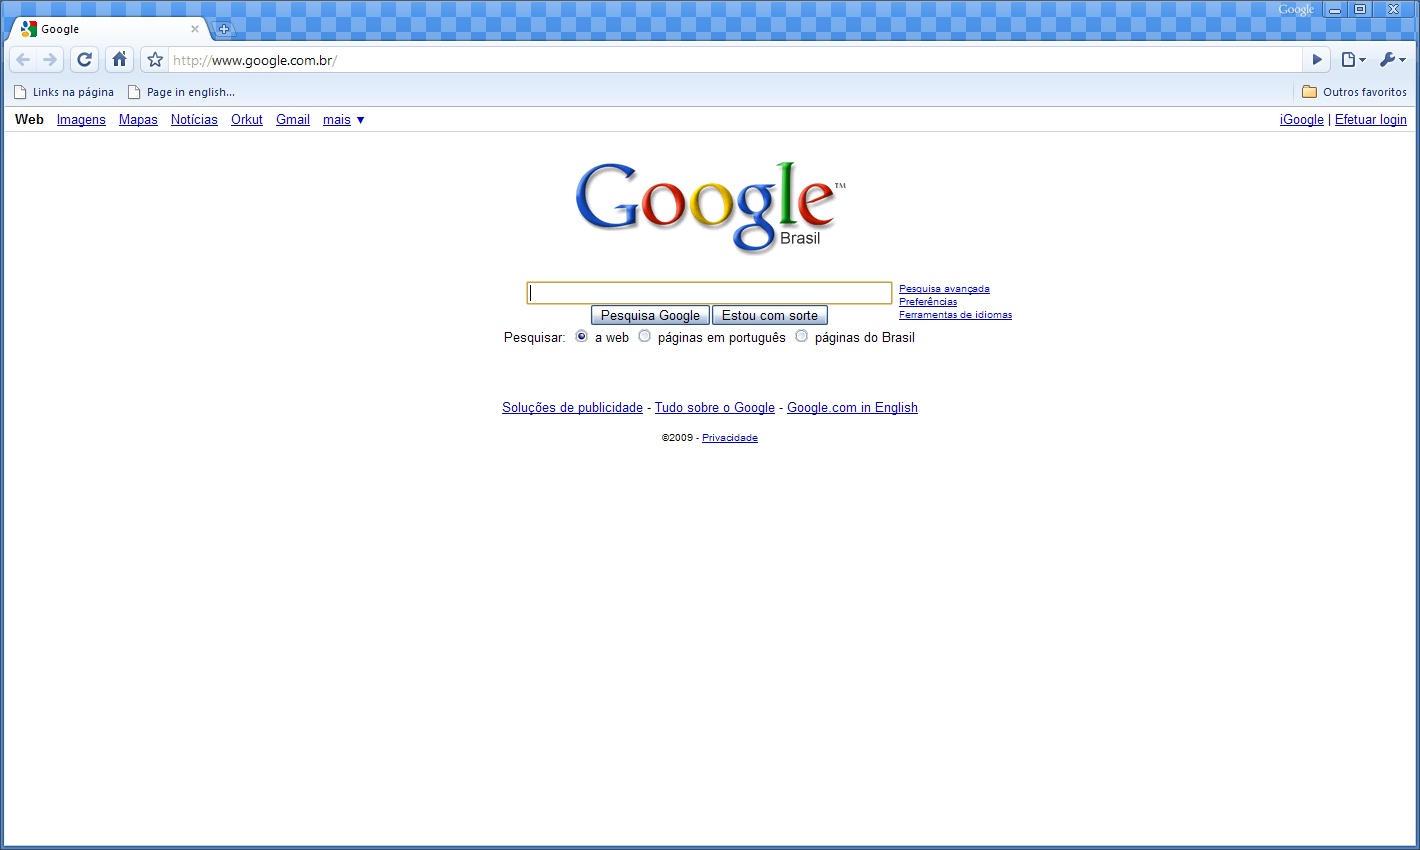 google wallpaper themes